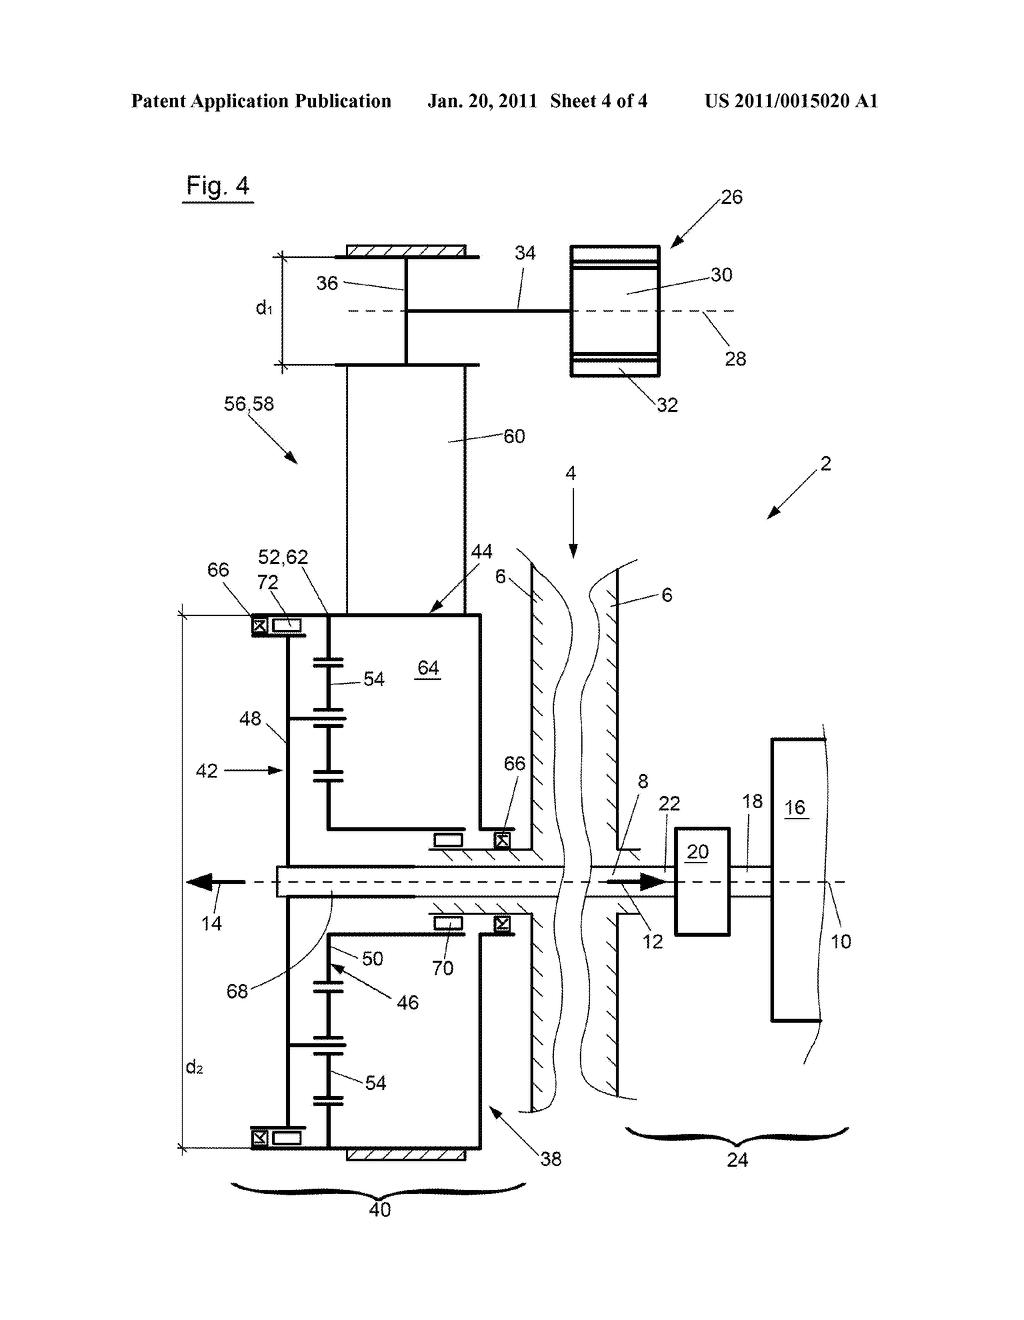 86 chevy silverado wiring diagram 2003 yamaha raptor 660 1987 r10 auto